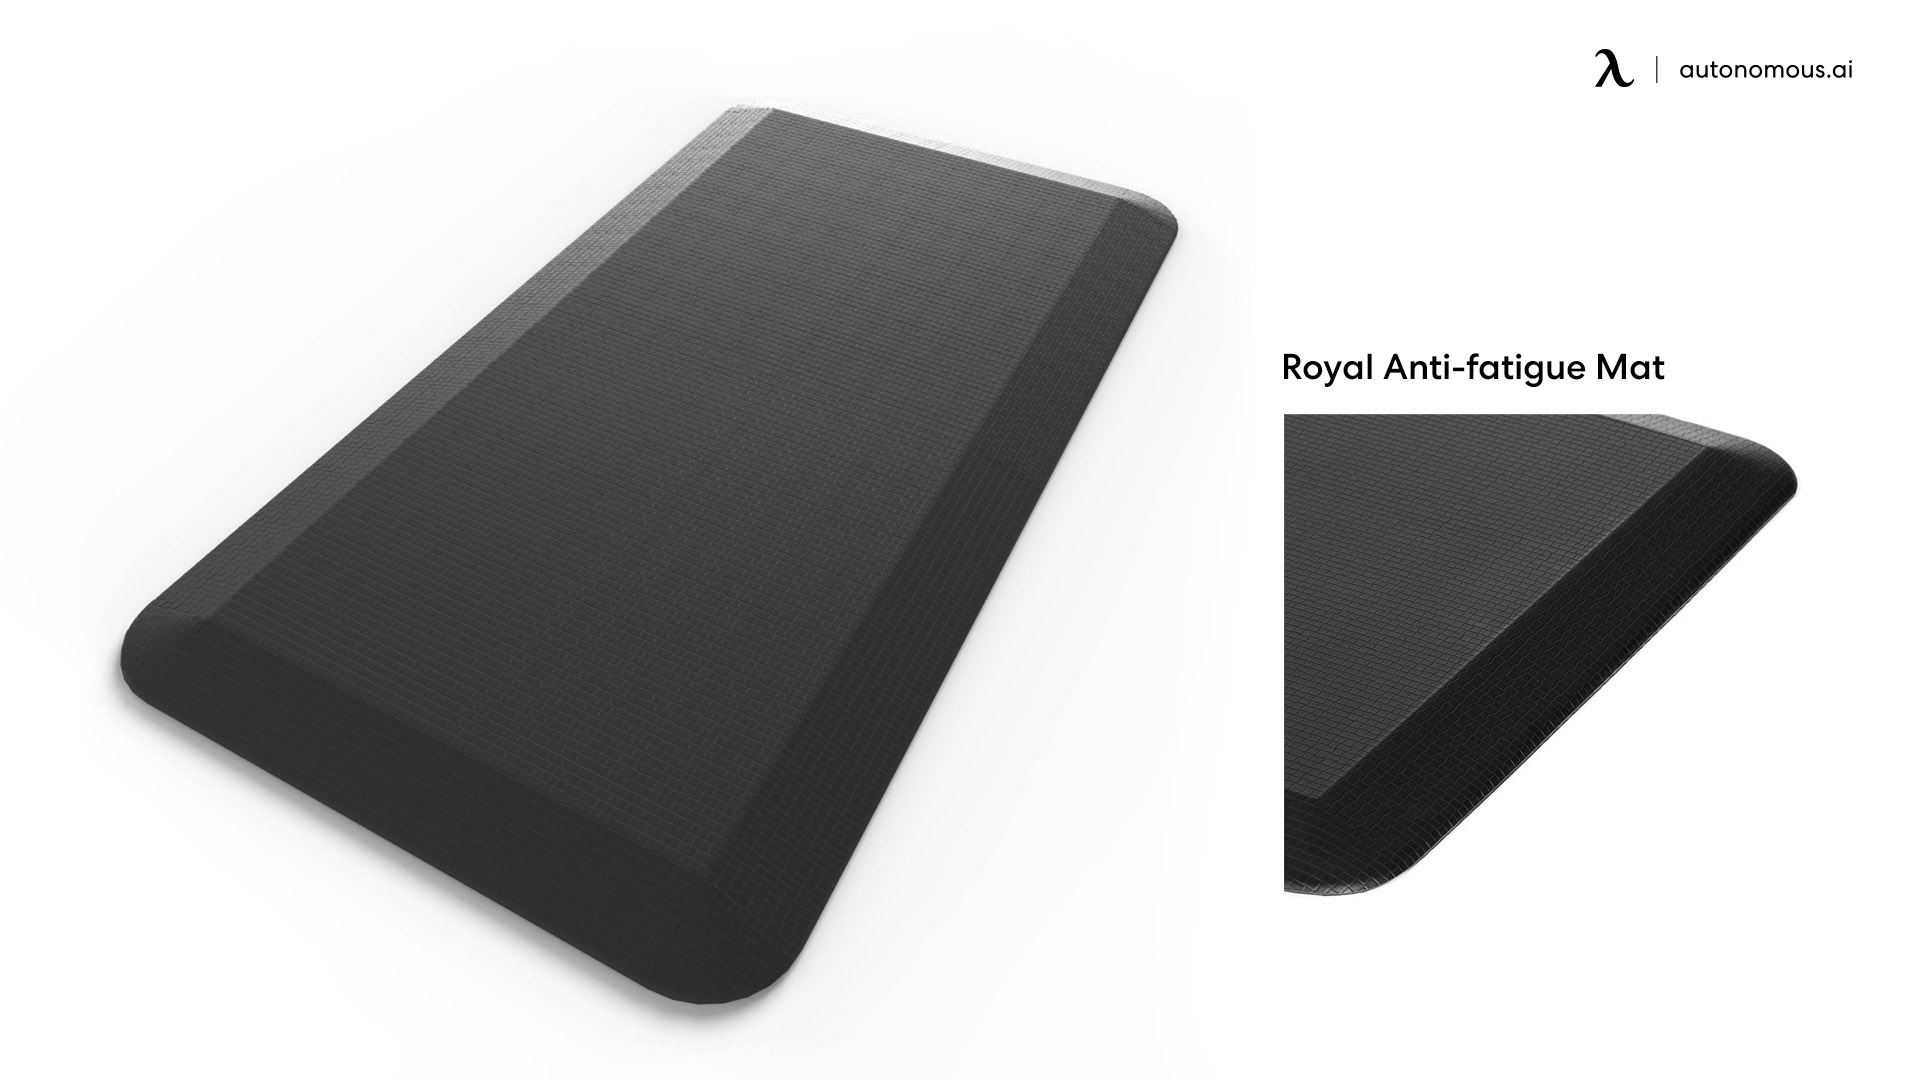 Royal Anti-fatigue Mat